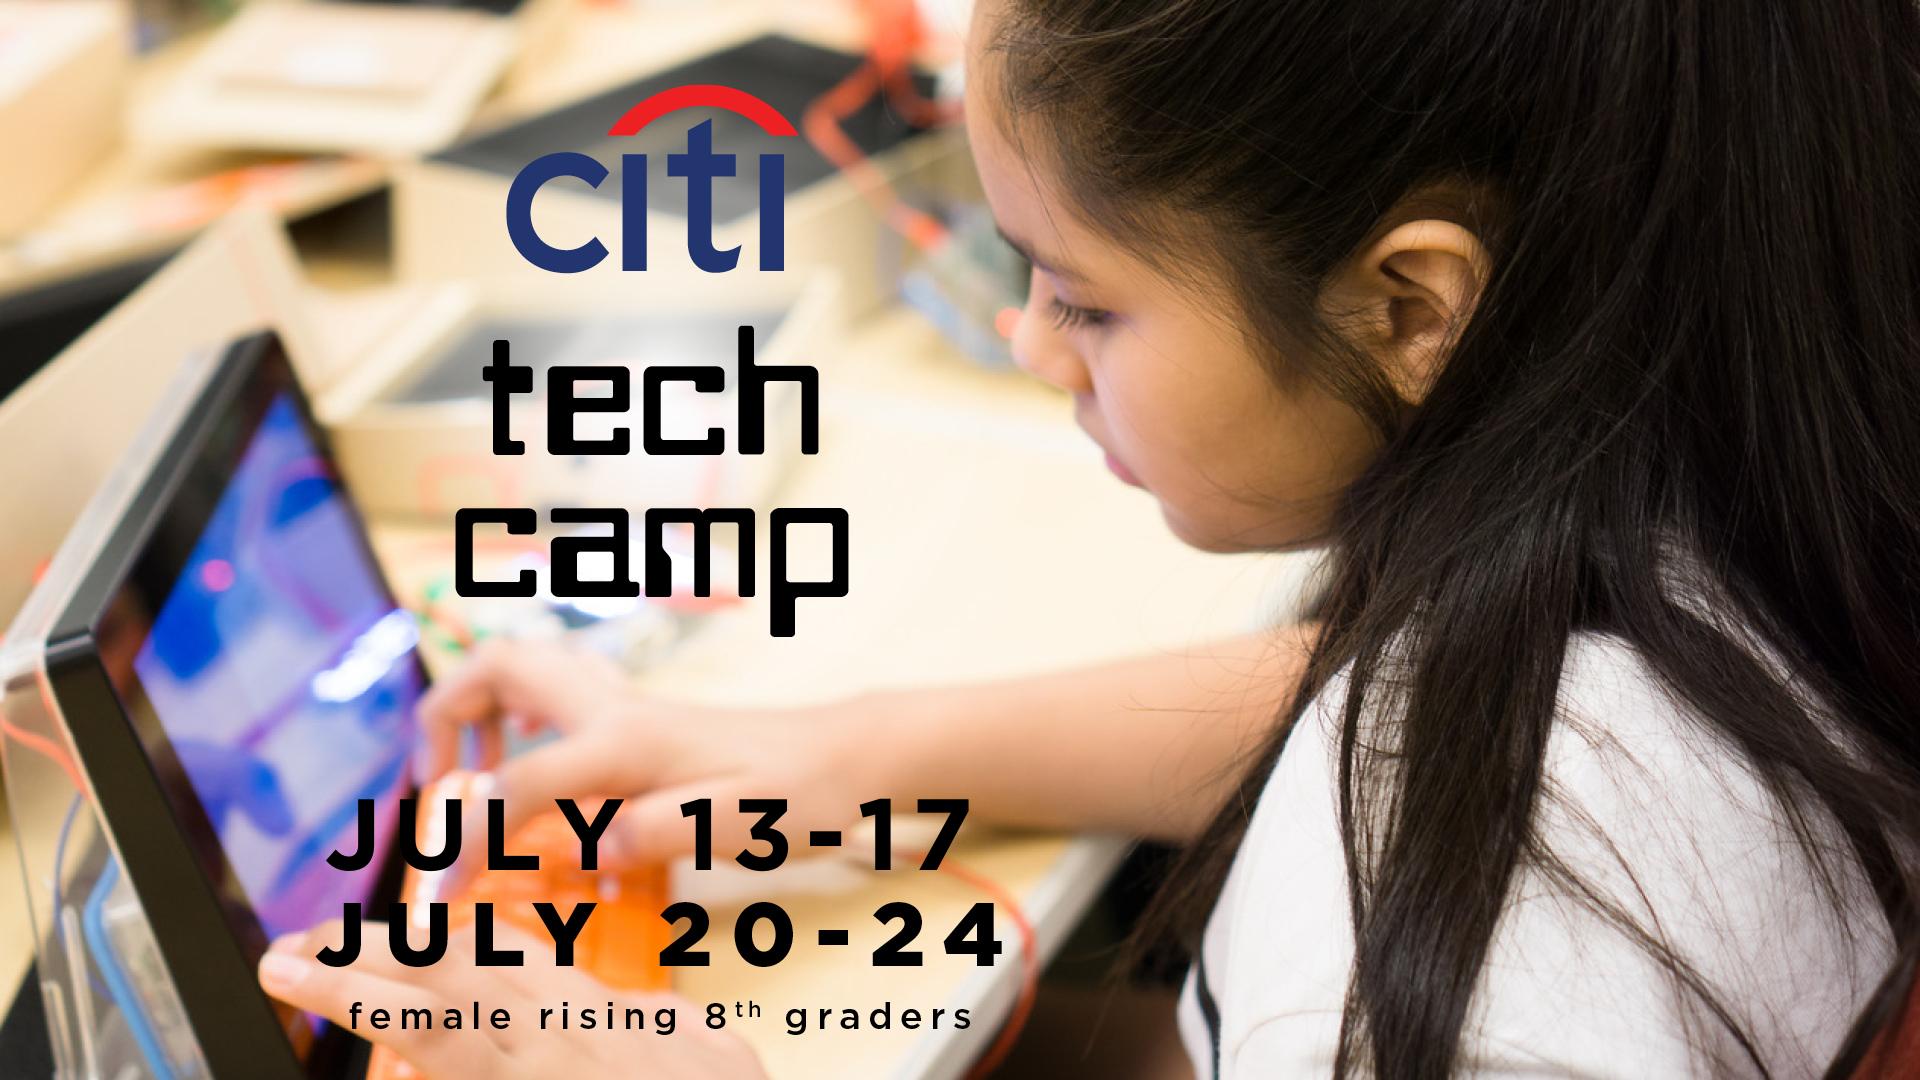 Citi Tech Camp